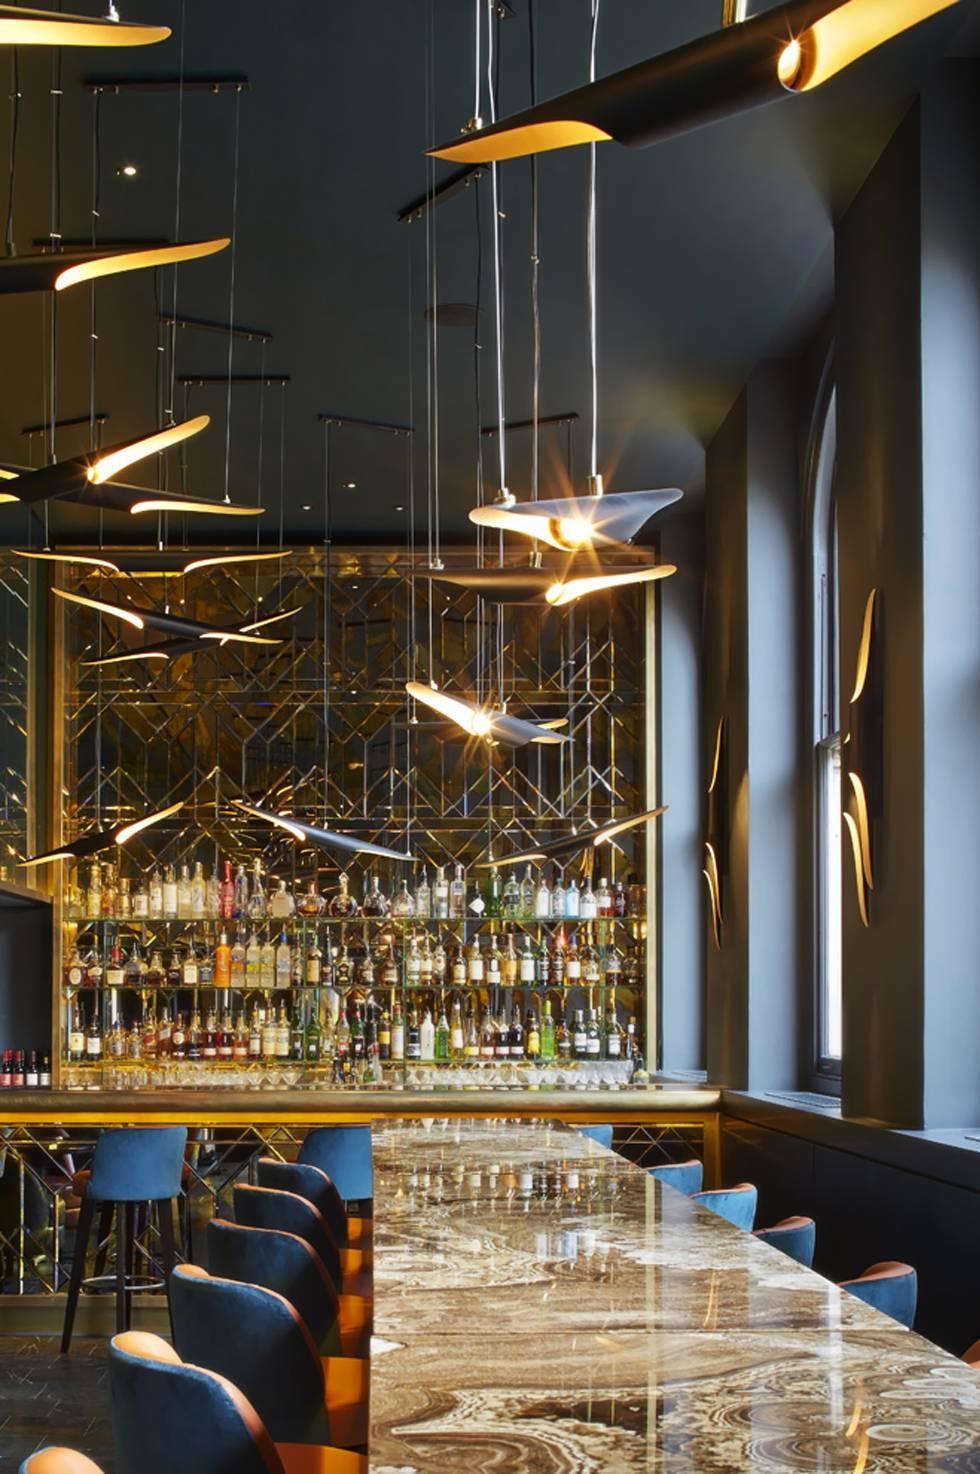 Coltrane Suspension Ceiling Lamp | Delightfull throughout Restaurant Pendant Lights (Image 3 of 15)